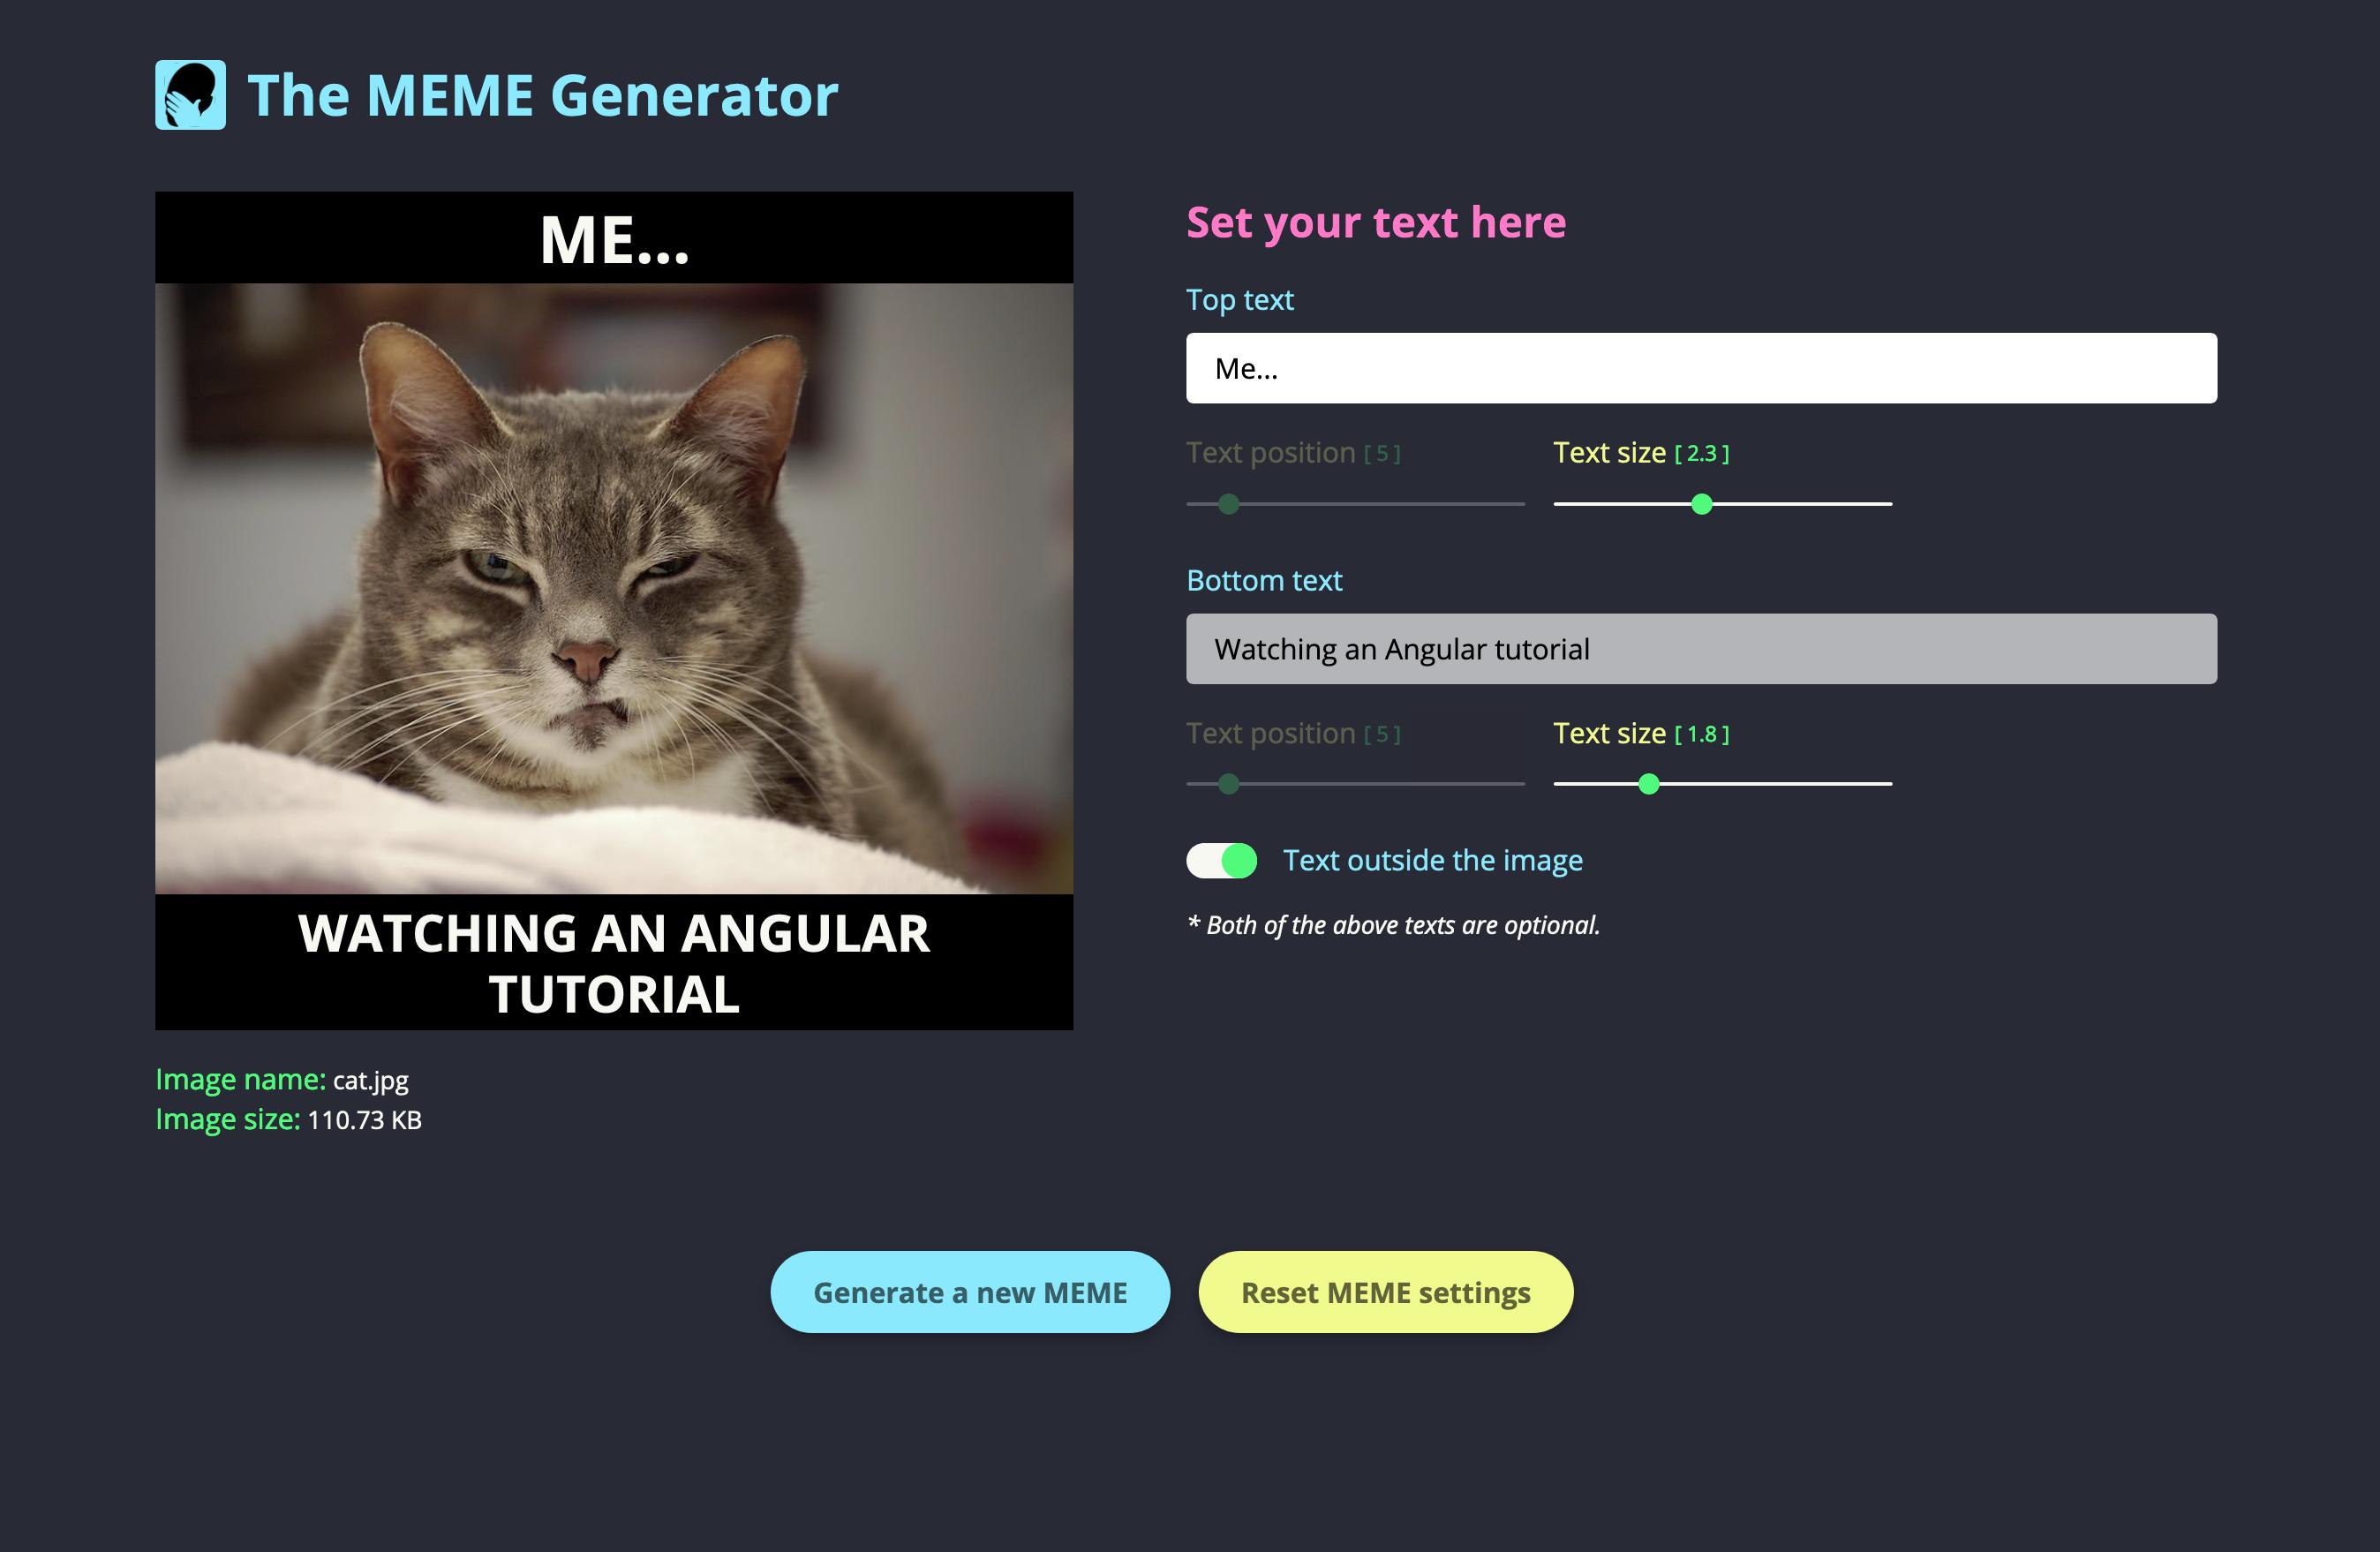 The MEME Generator